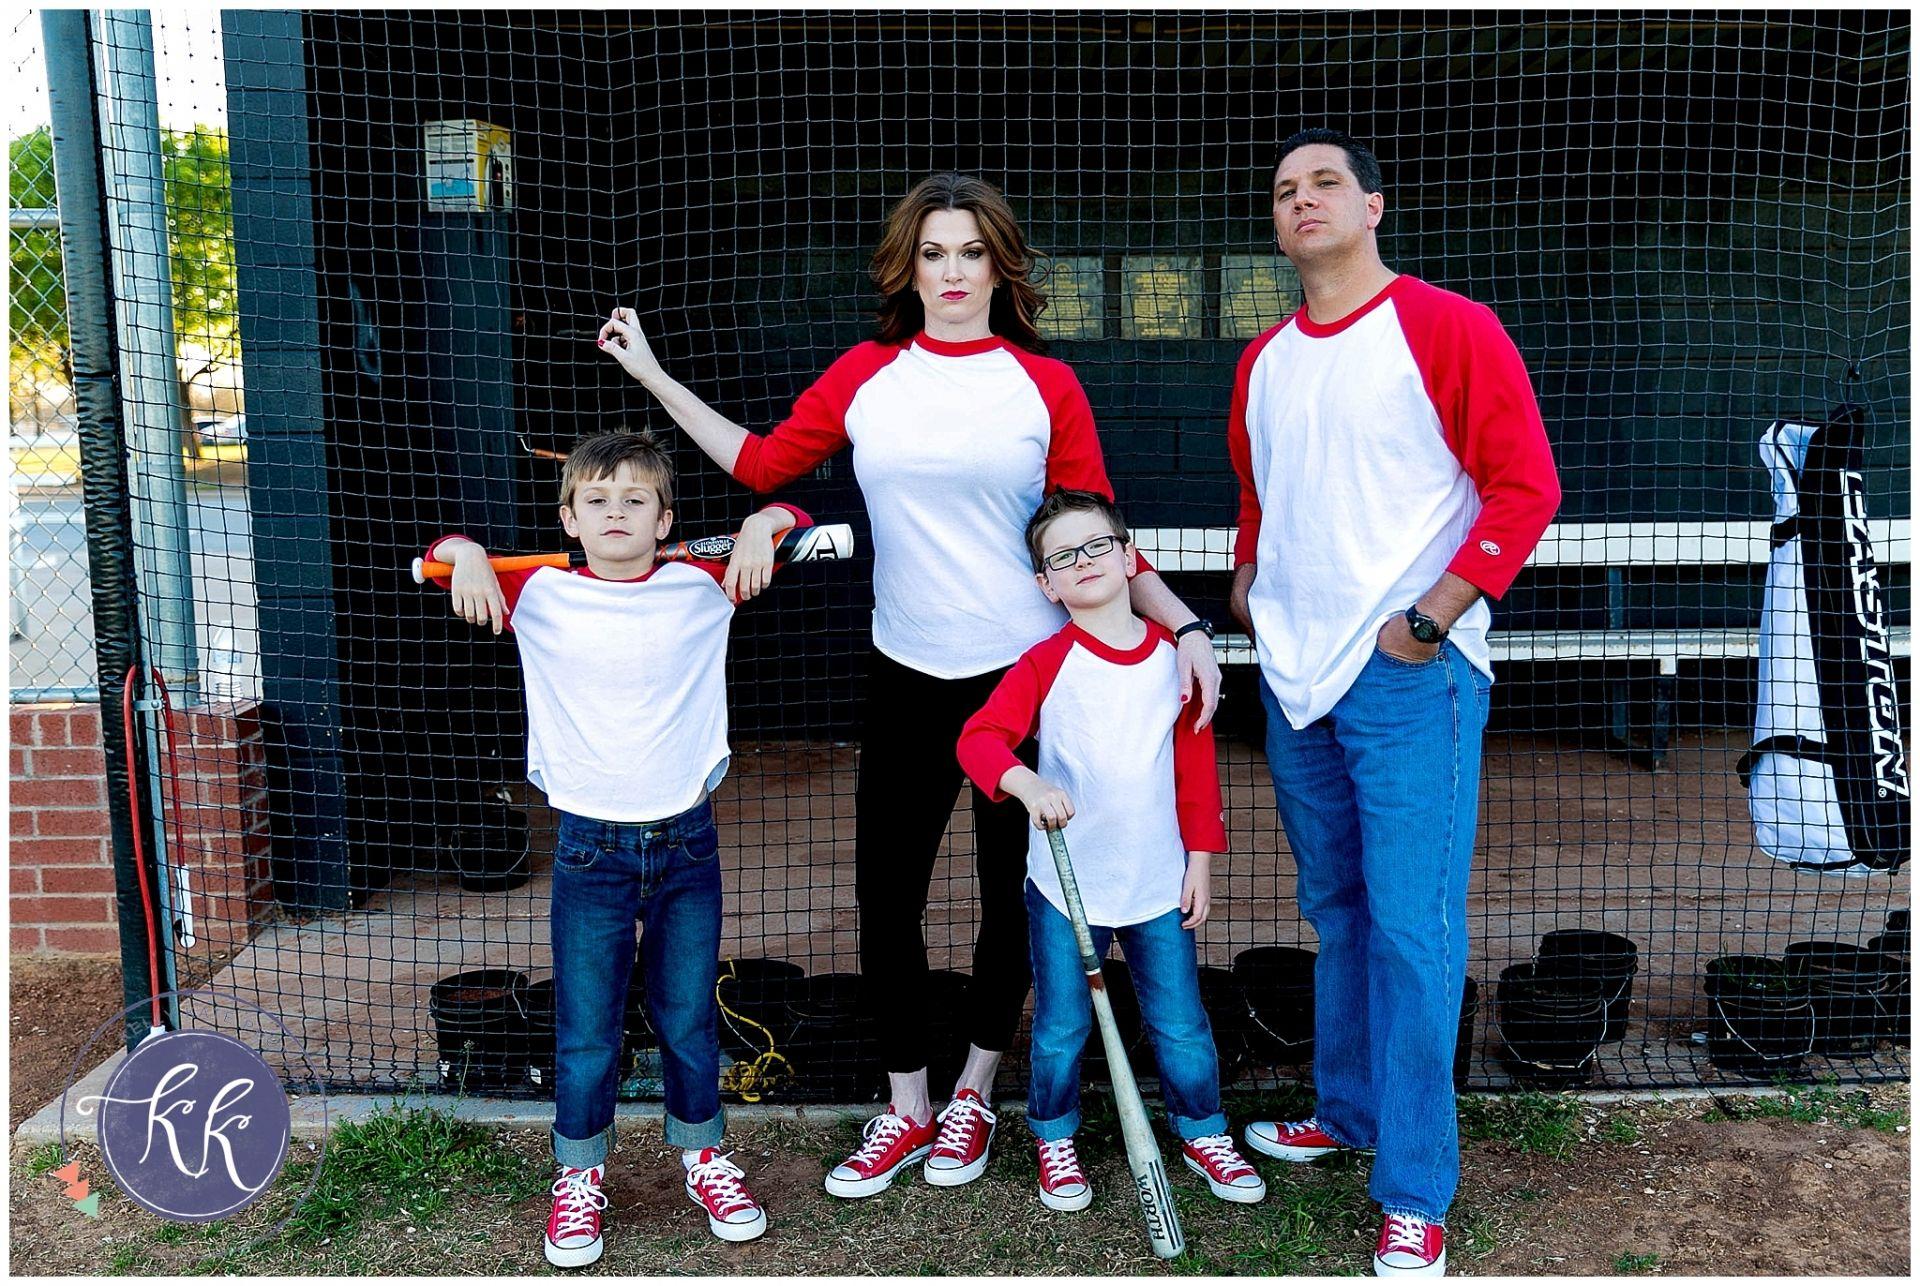 The Mcfamily Baseball Family Family Pictures Baseball Photography